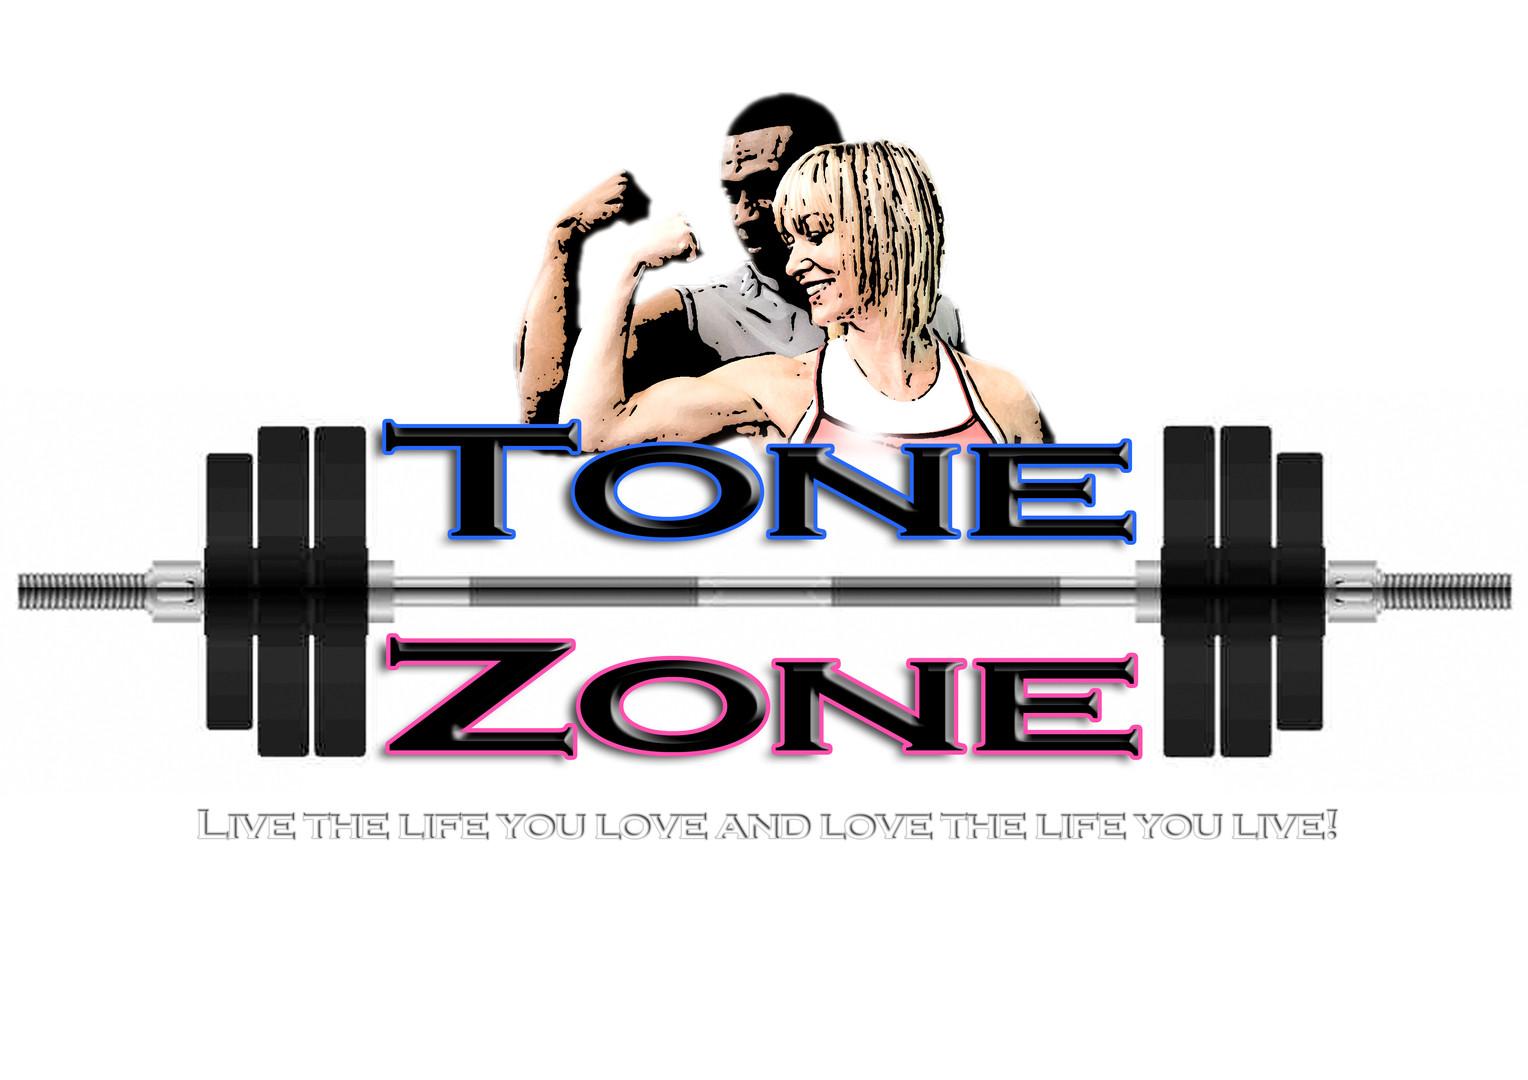 tone zone2 (2).jpg